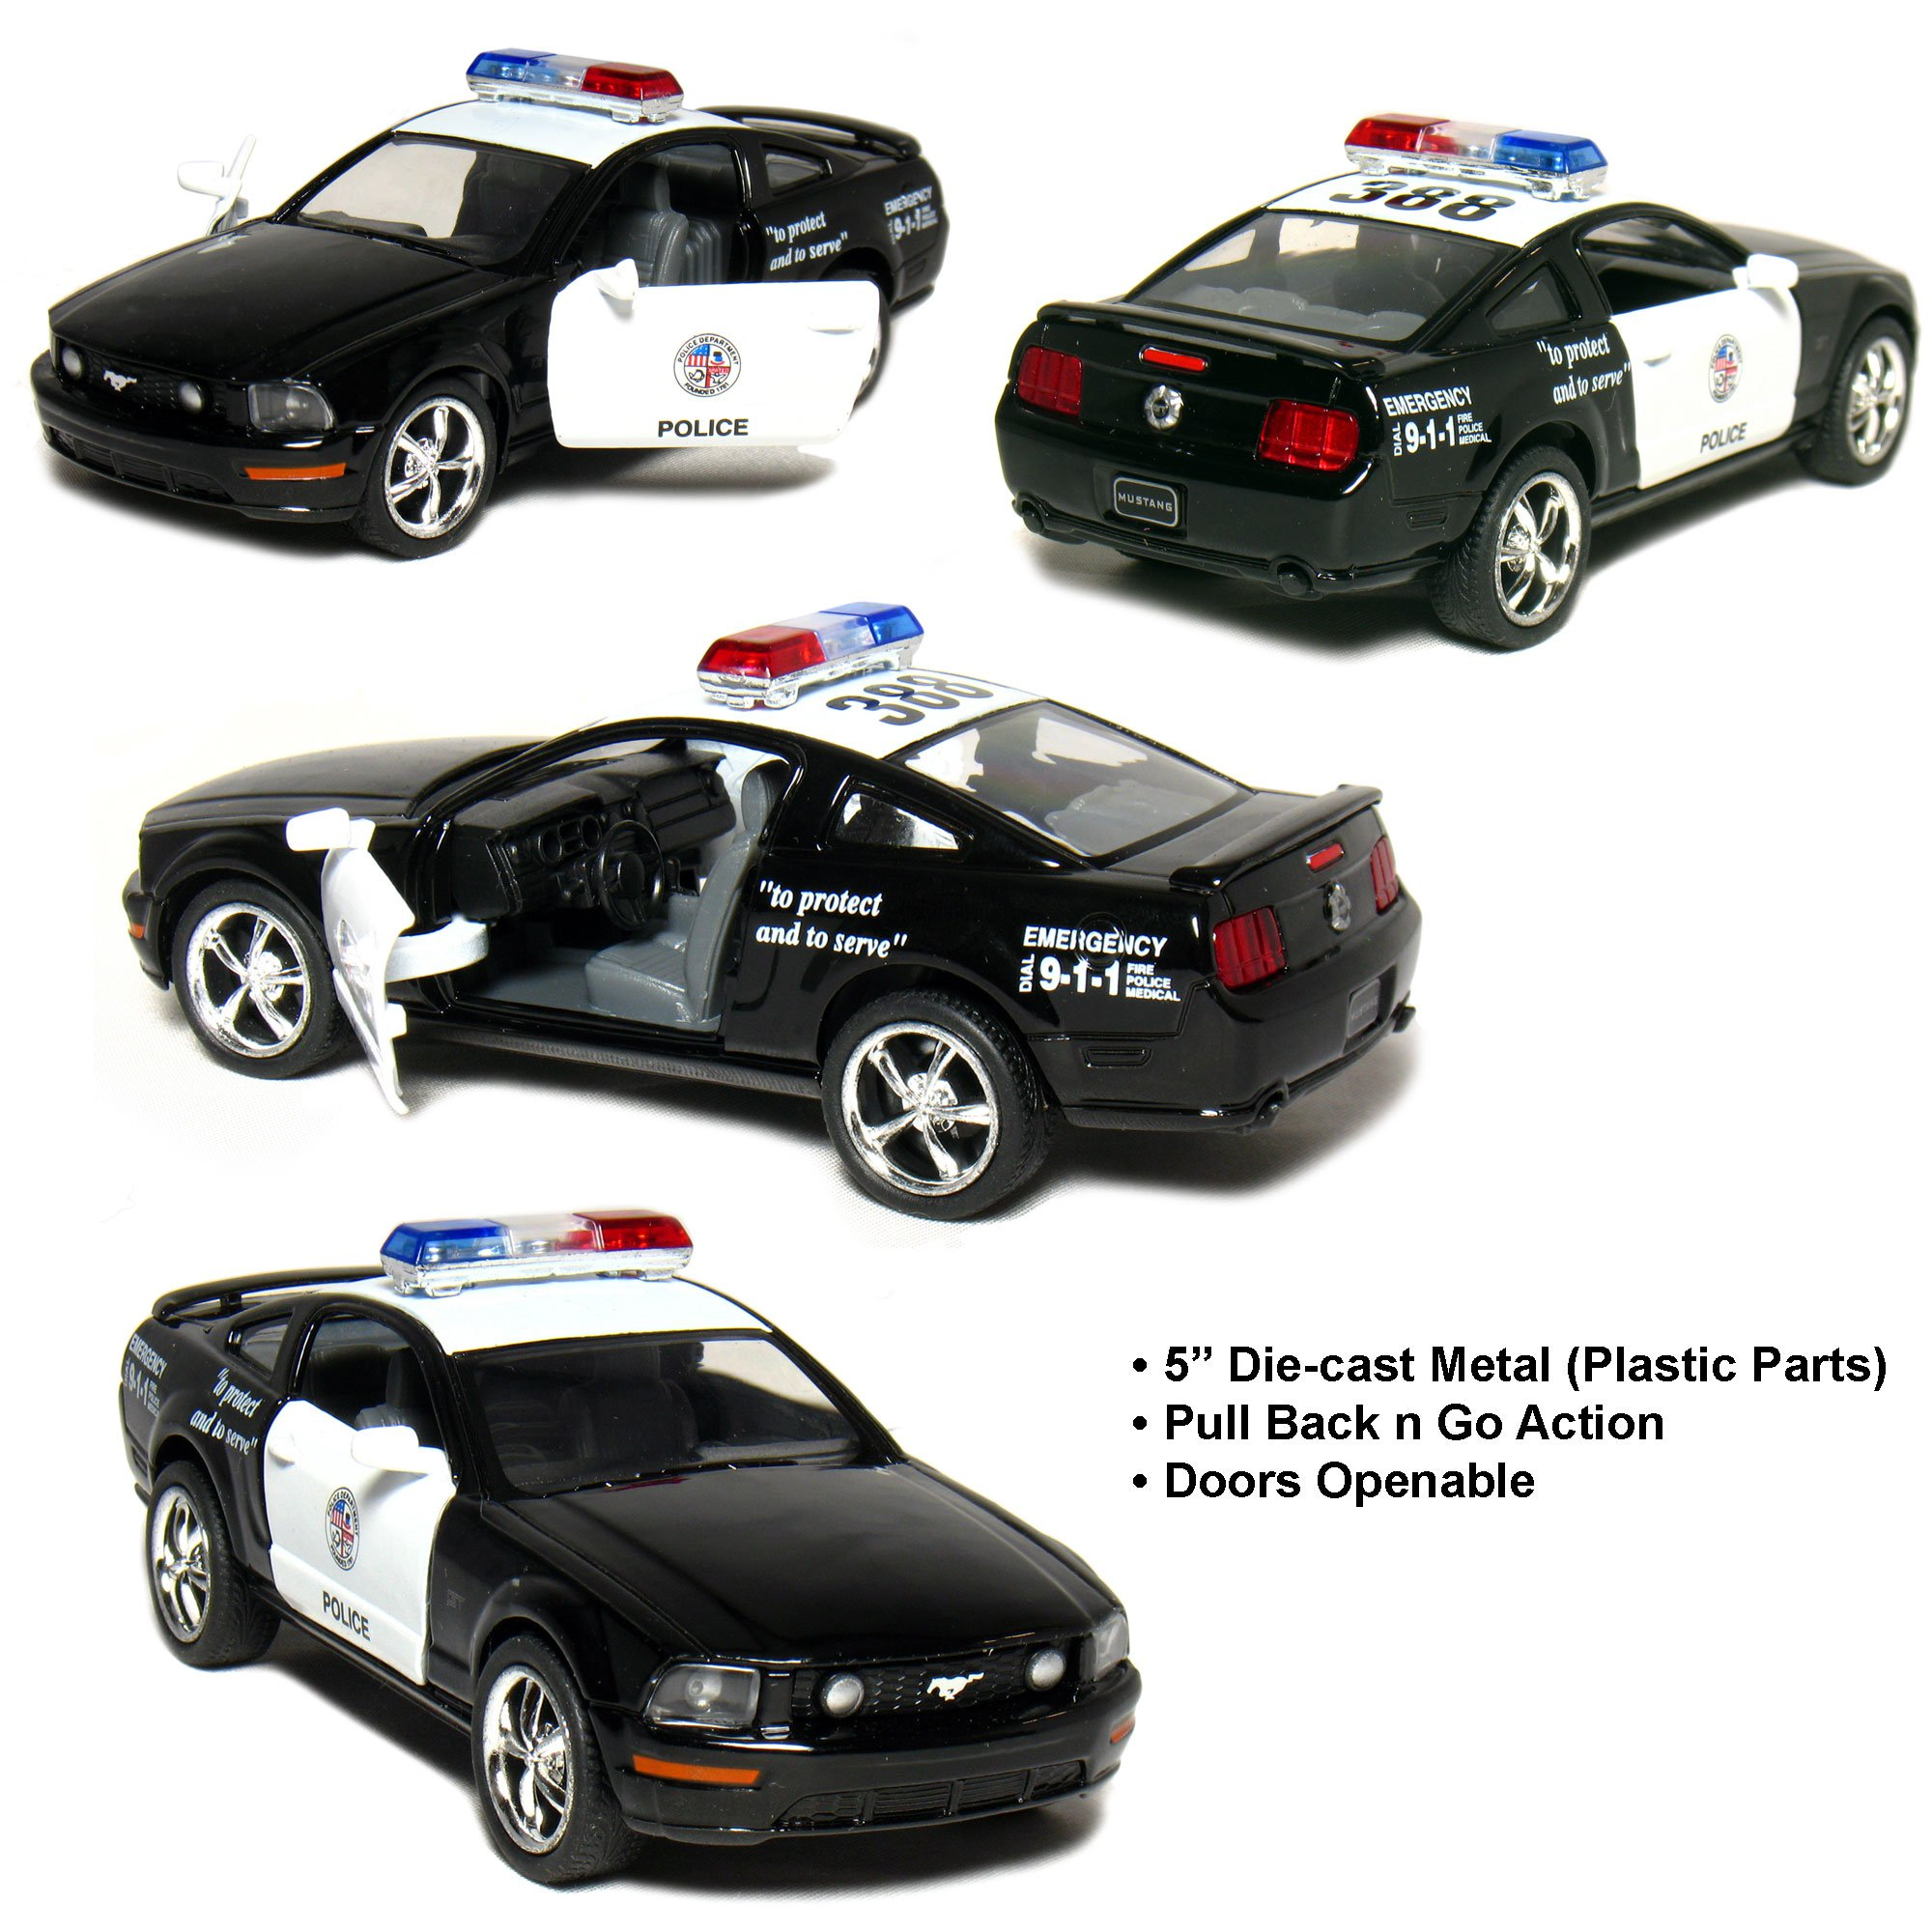 Ford Mustang GT Police 2006 Black & White 1-38 Toywonder